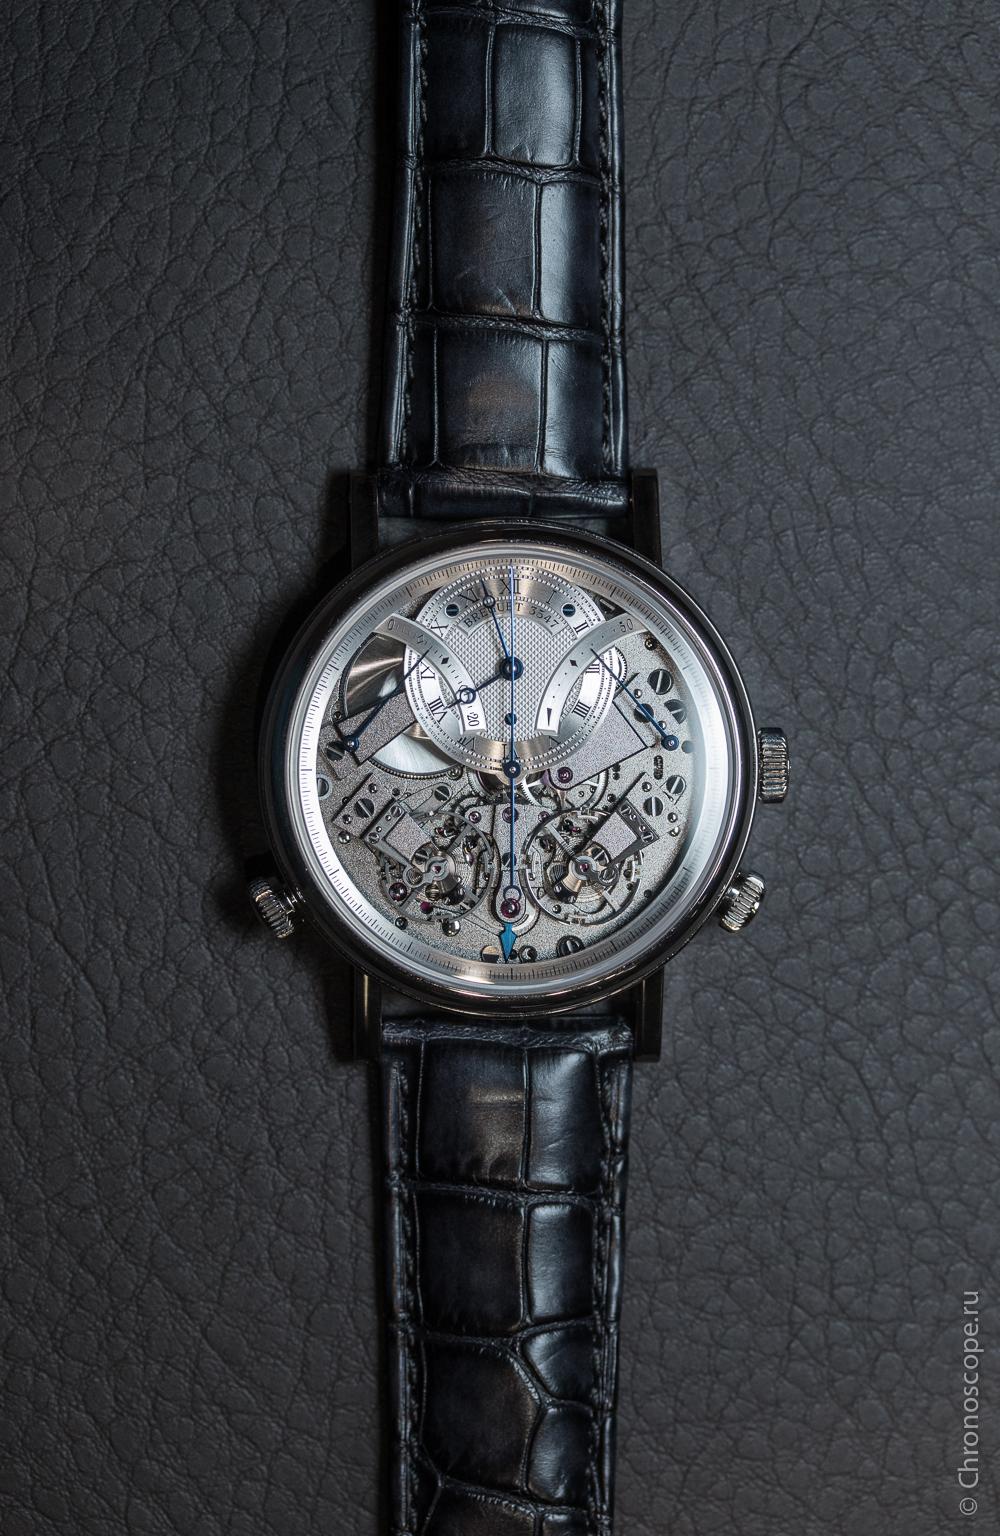 Breguet Chronographe Independant-6